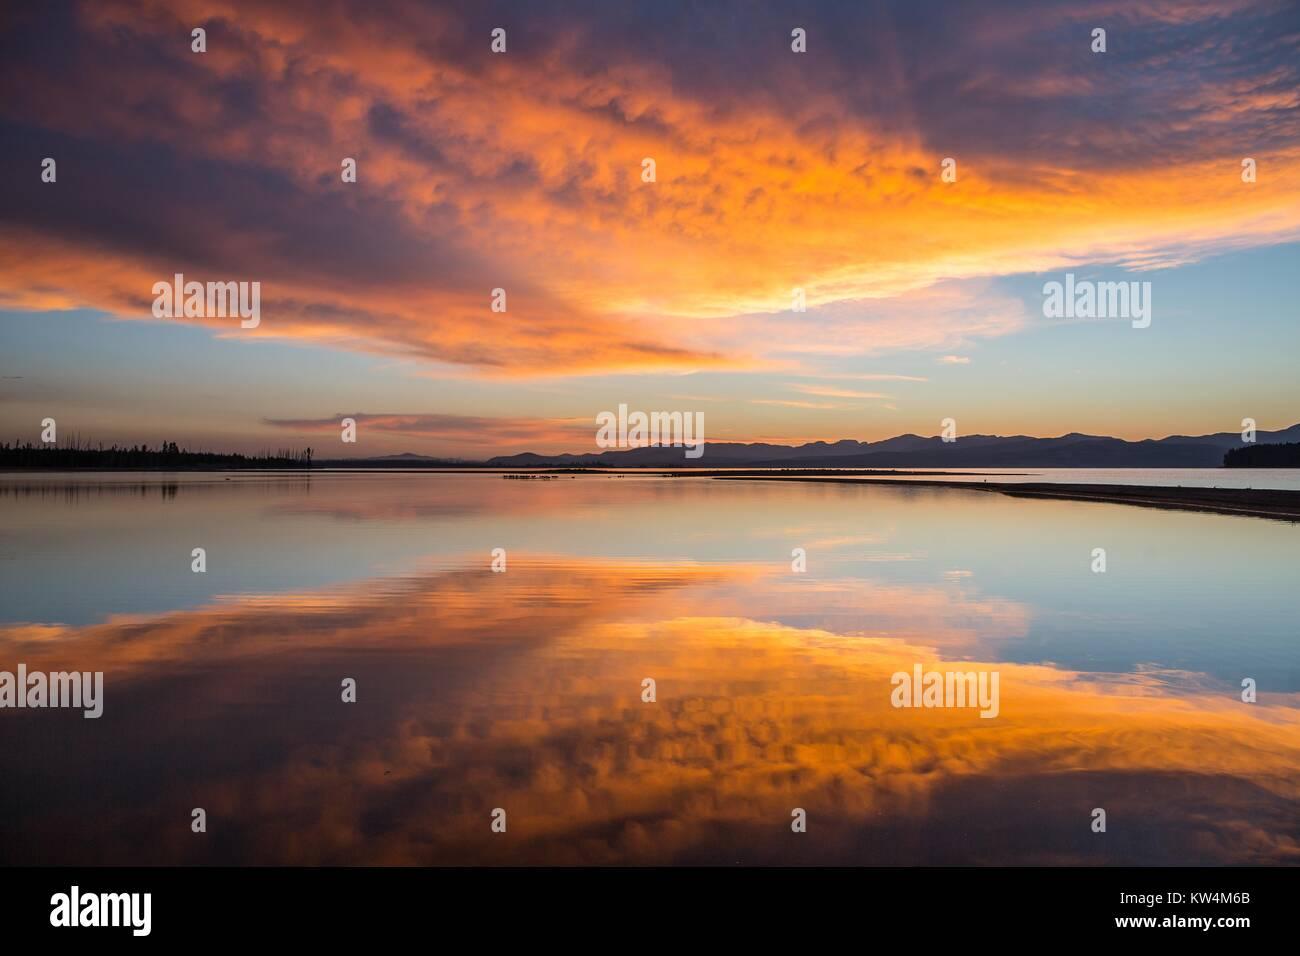 The Flat Mountain arm of Yellowstone Lake at sunrise, Yellowstone National Park, Wyoming, 2016. Image courtesy Neal Stock Photo